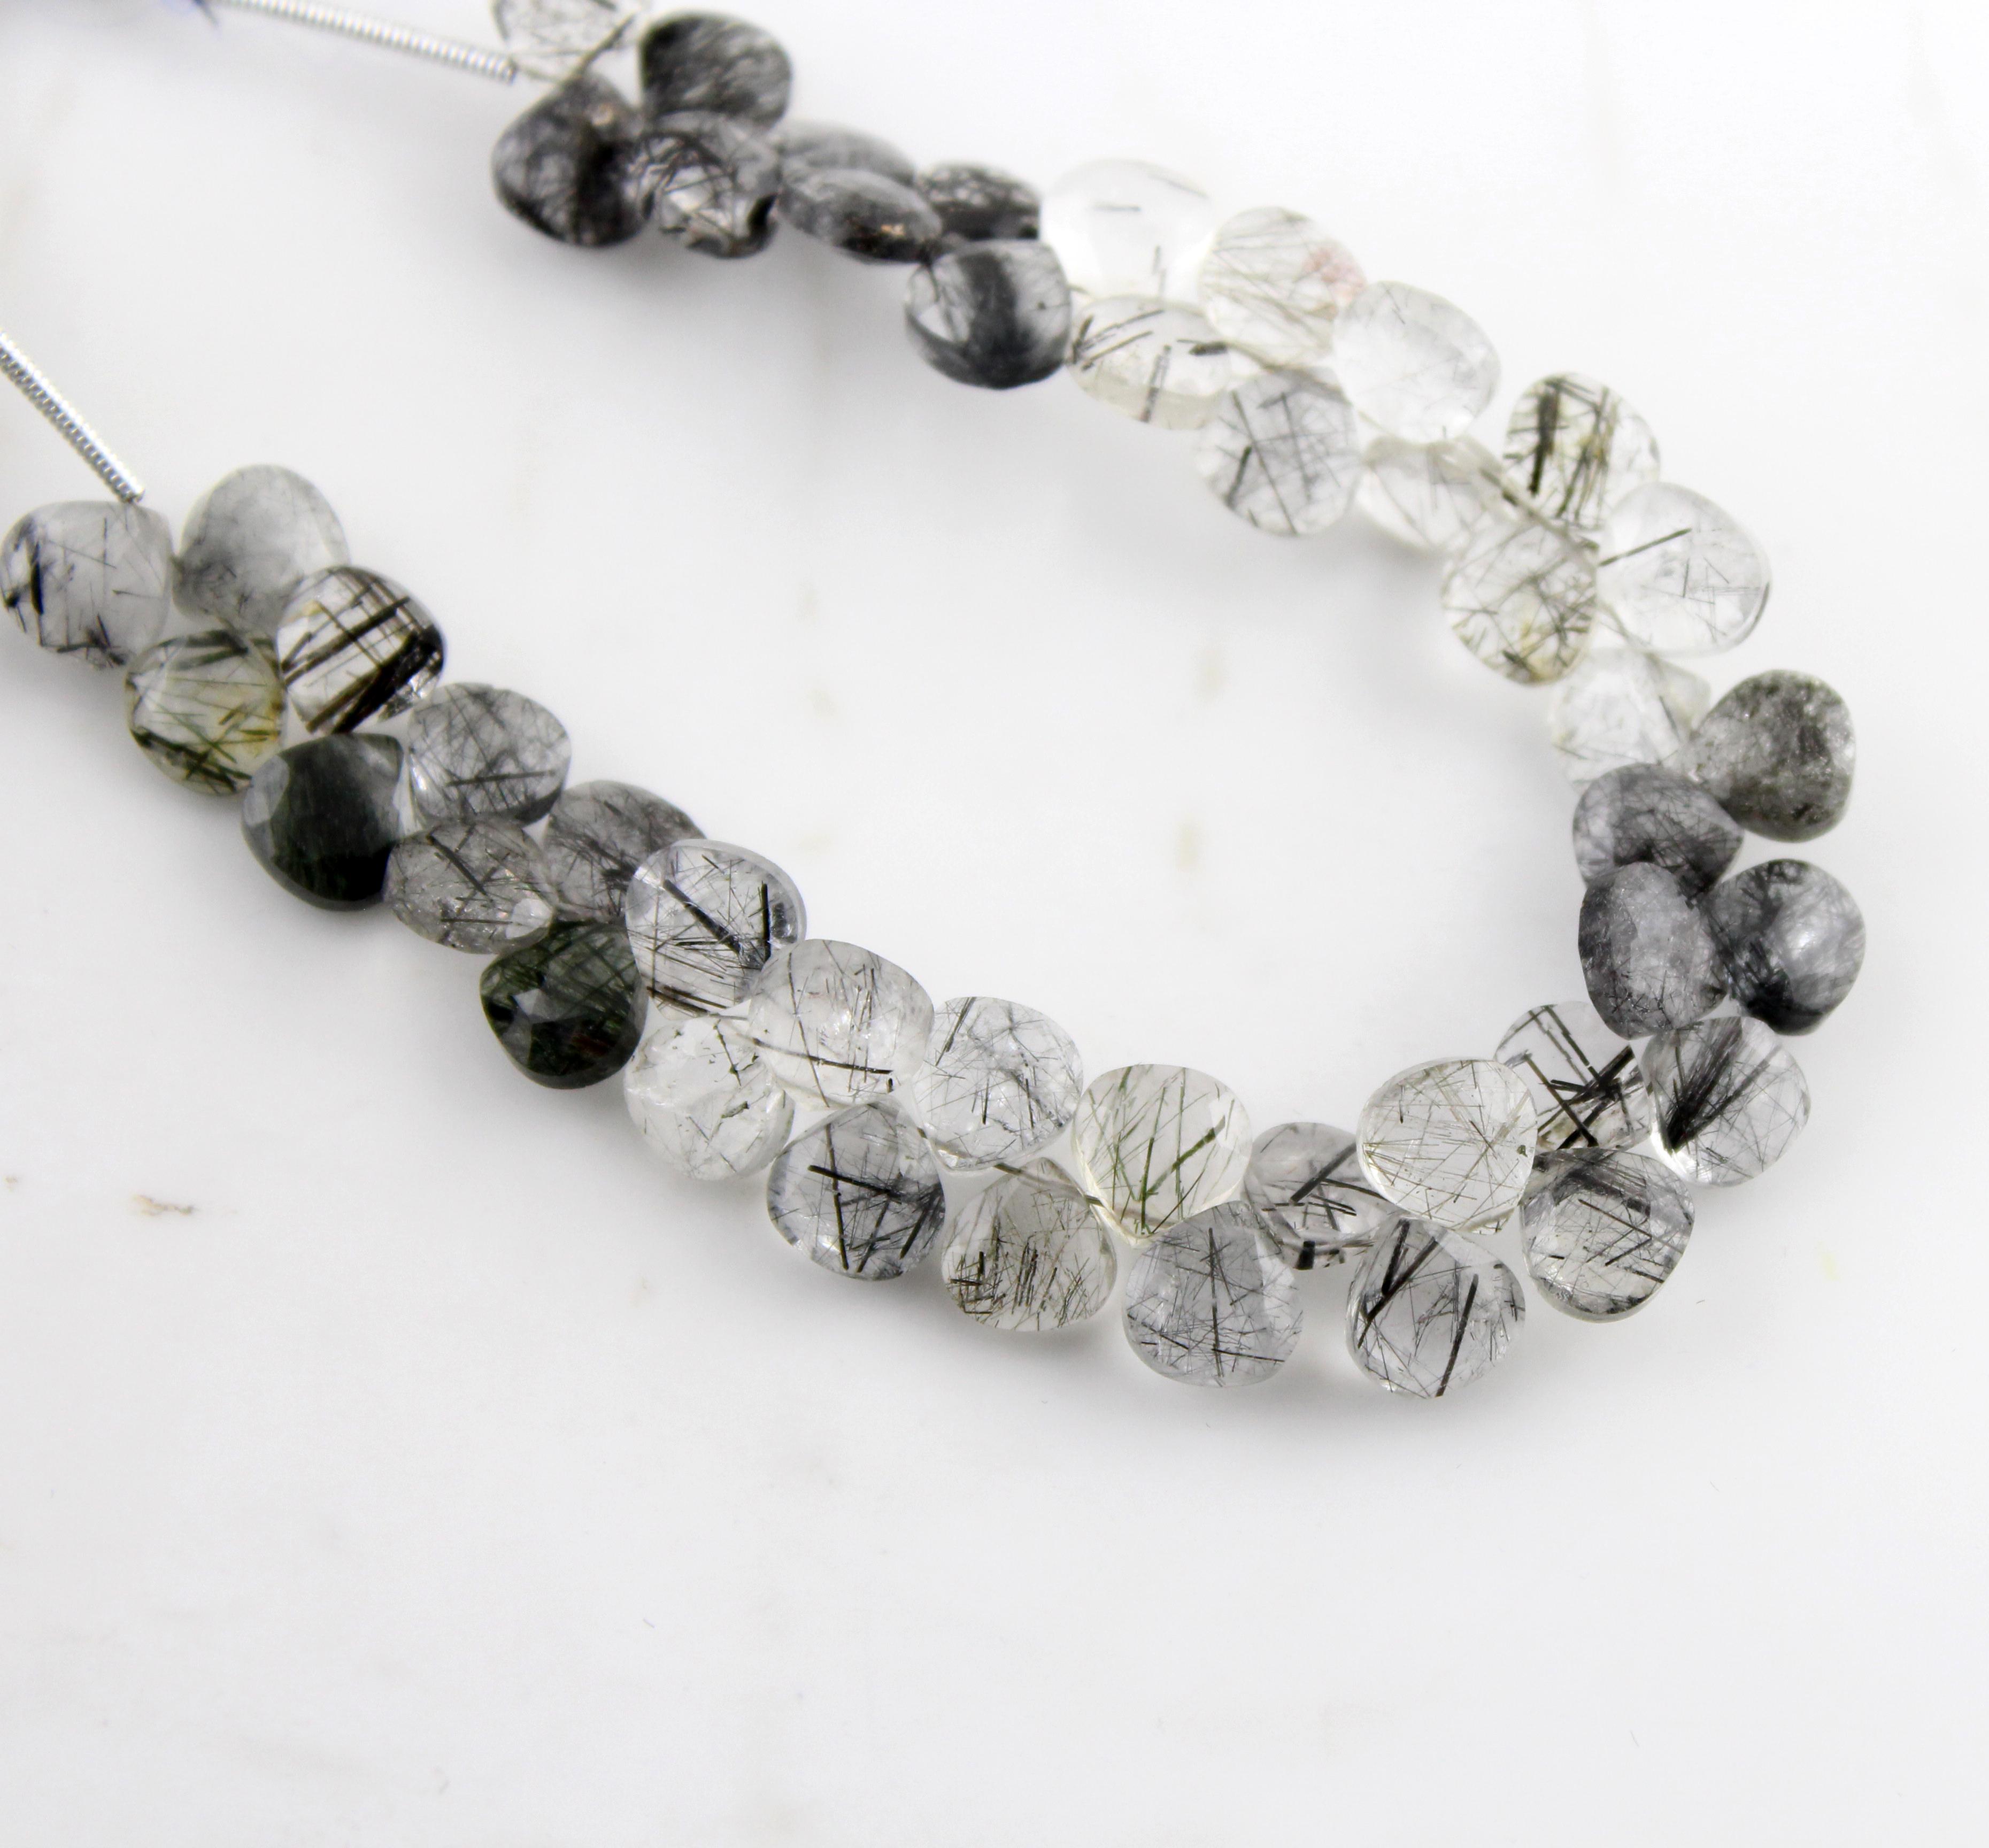 Black Rutile Quartz Heart Beads